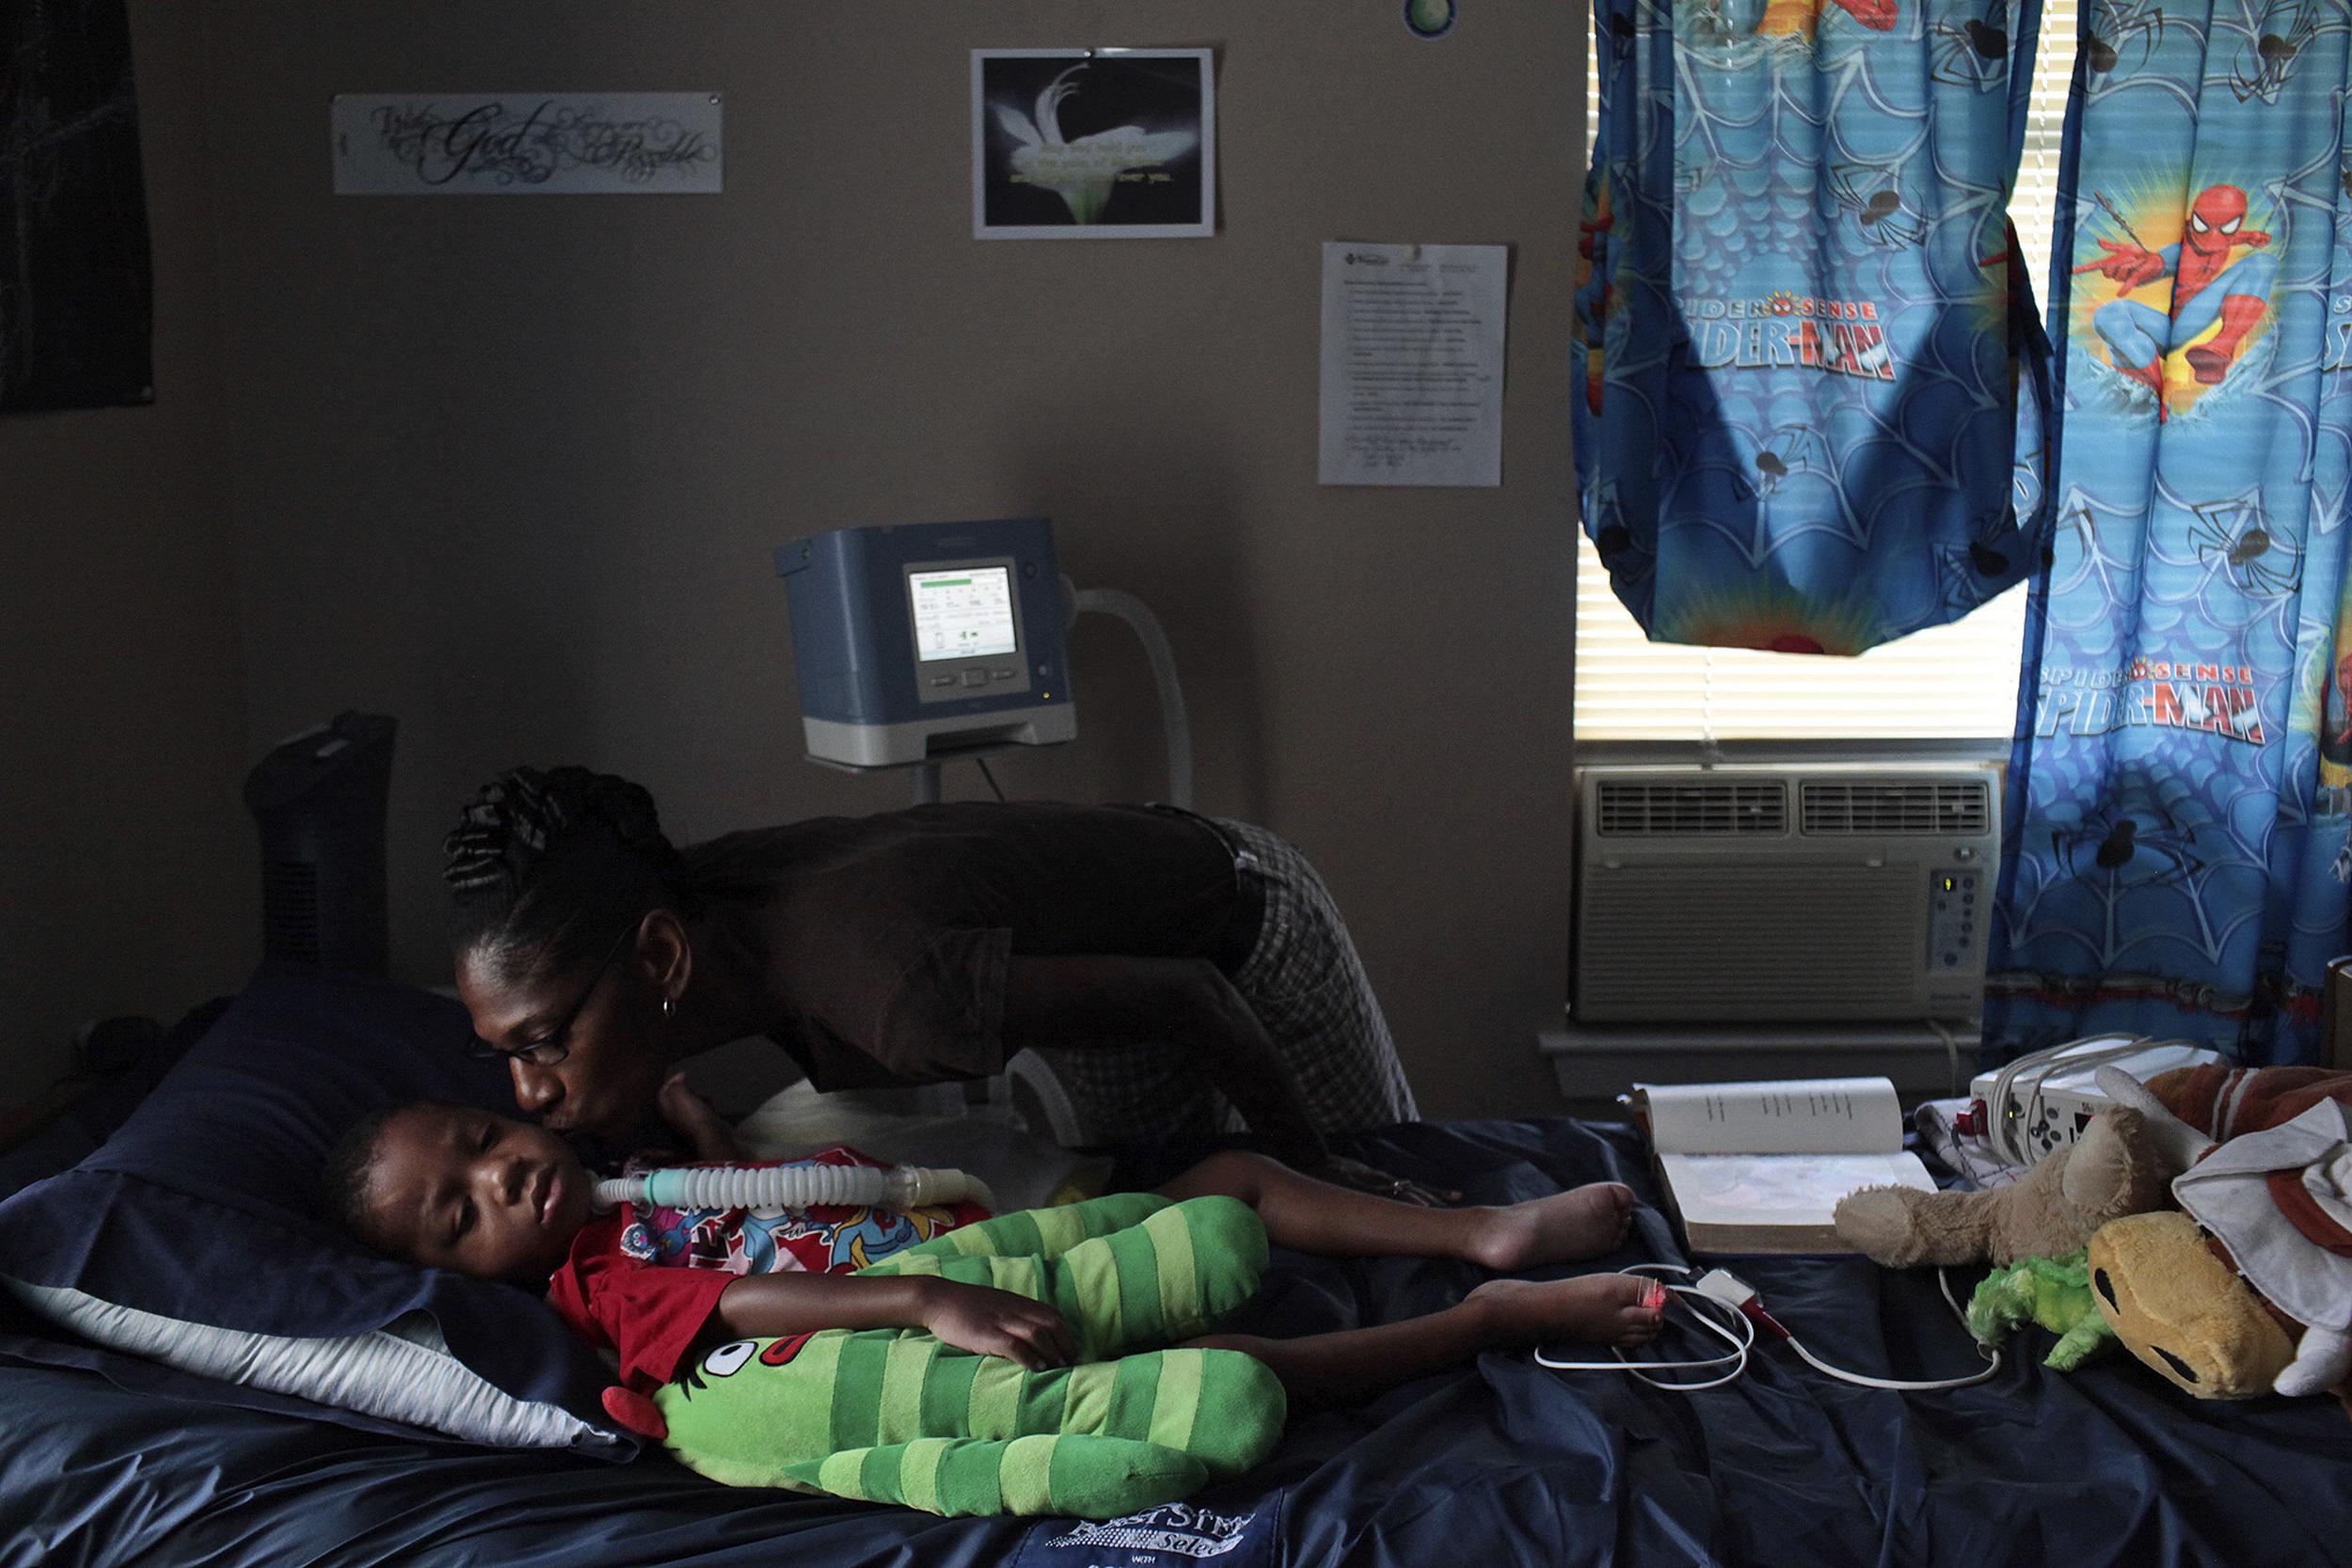 Rhodena Matthews, kisses her grandson, Braylon Nelson, 2, who was paralyzed in a road rage accident, at his home in San Antonio. © Lisa Krantz/San Antonio Express-News/ZUMA Press